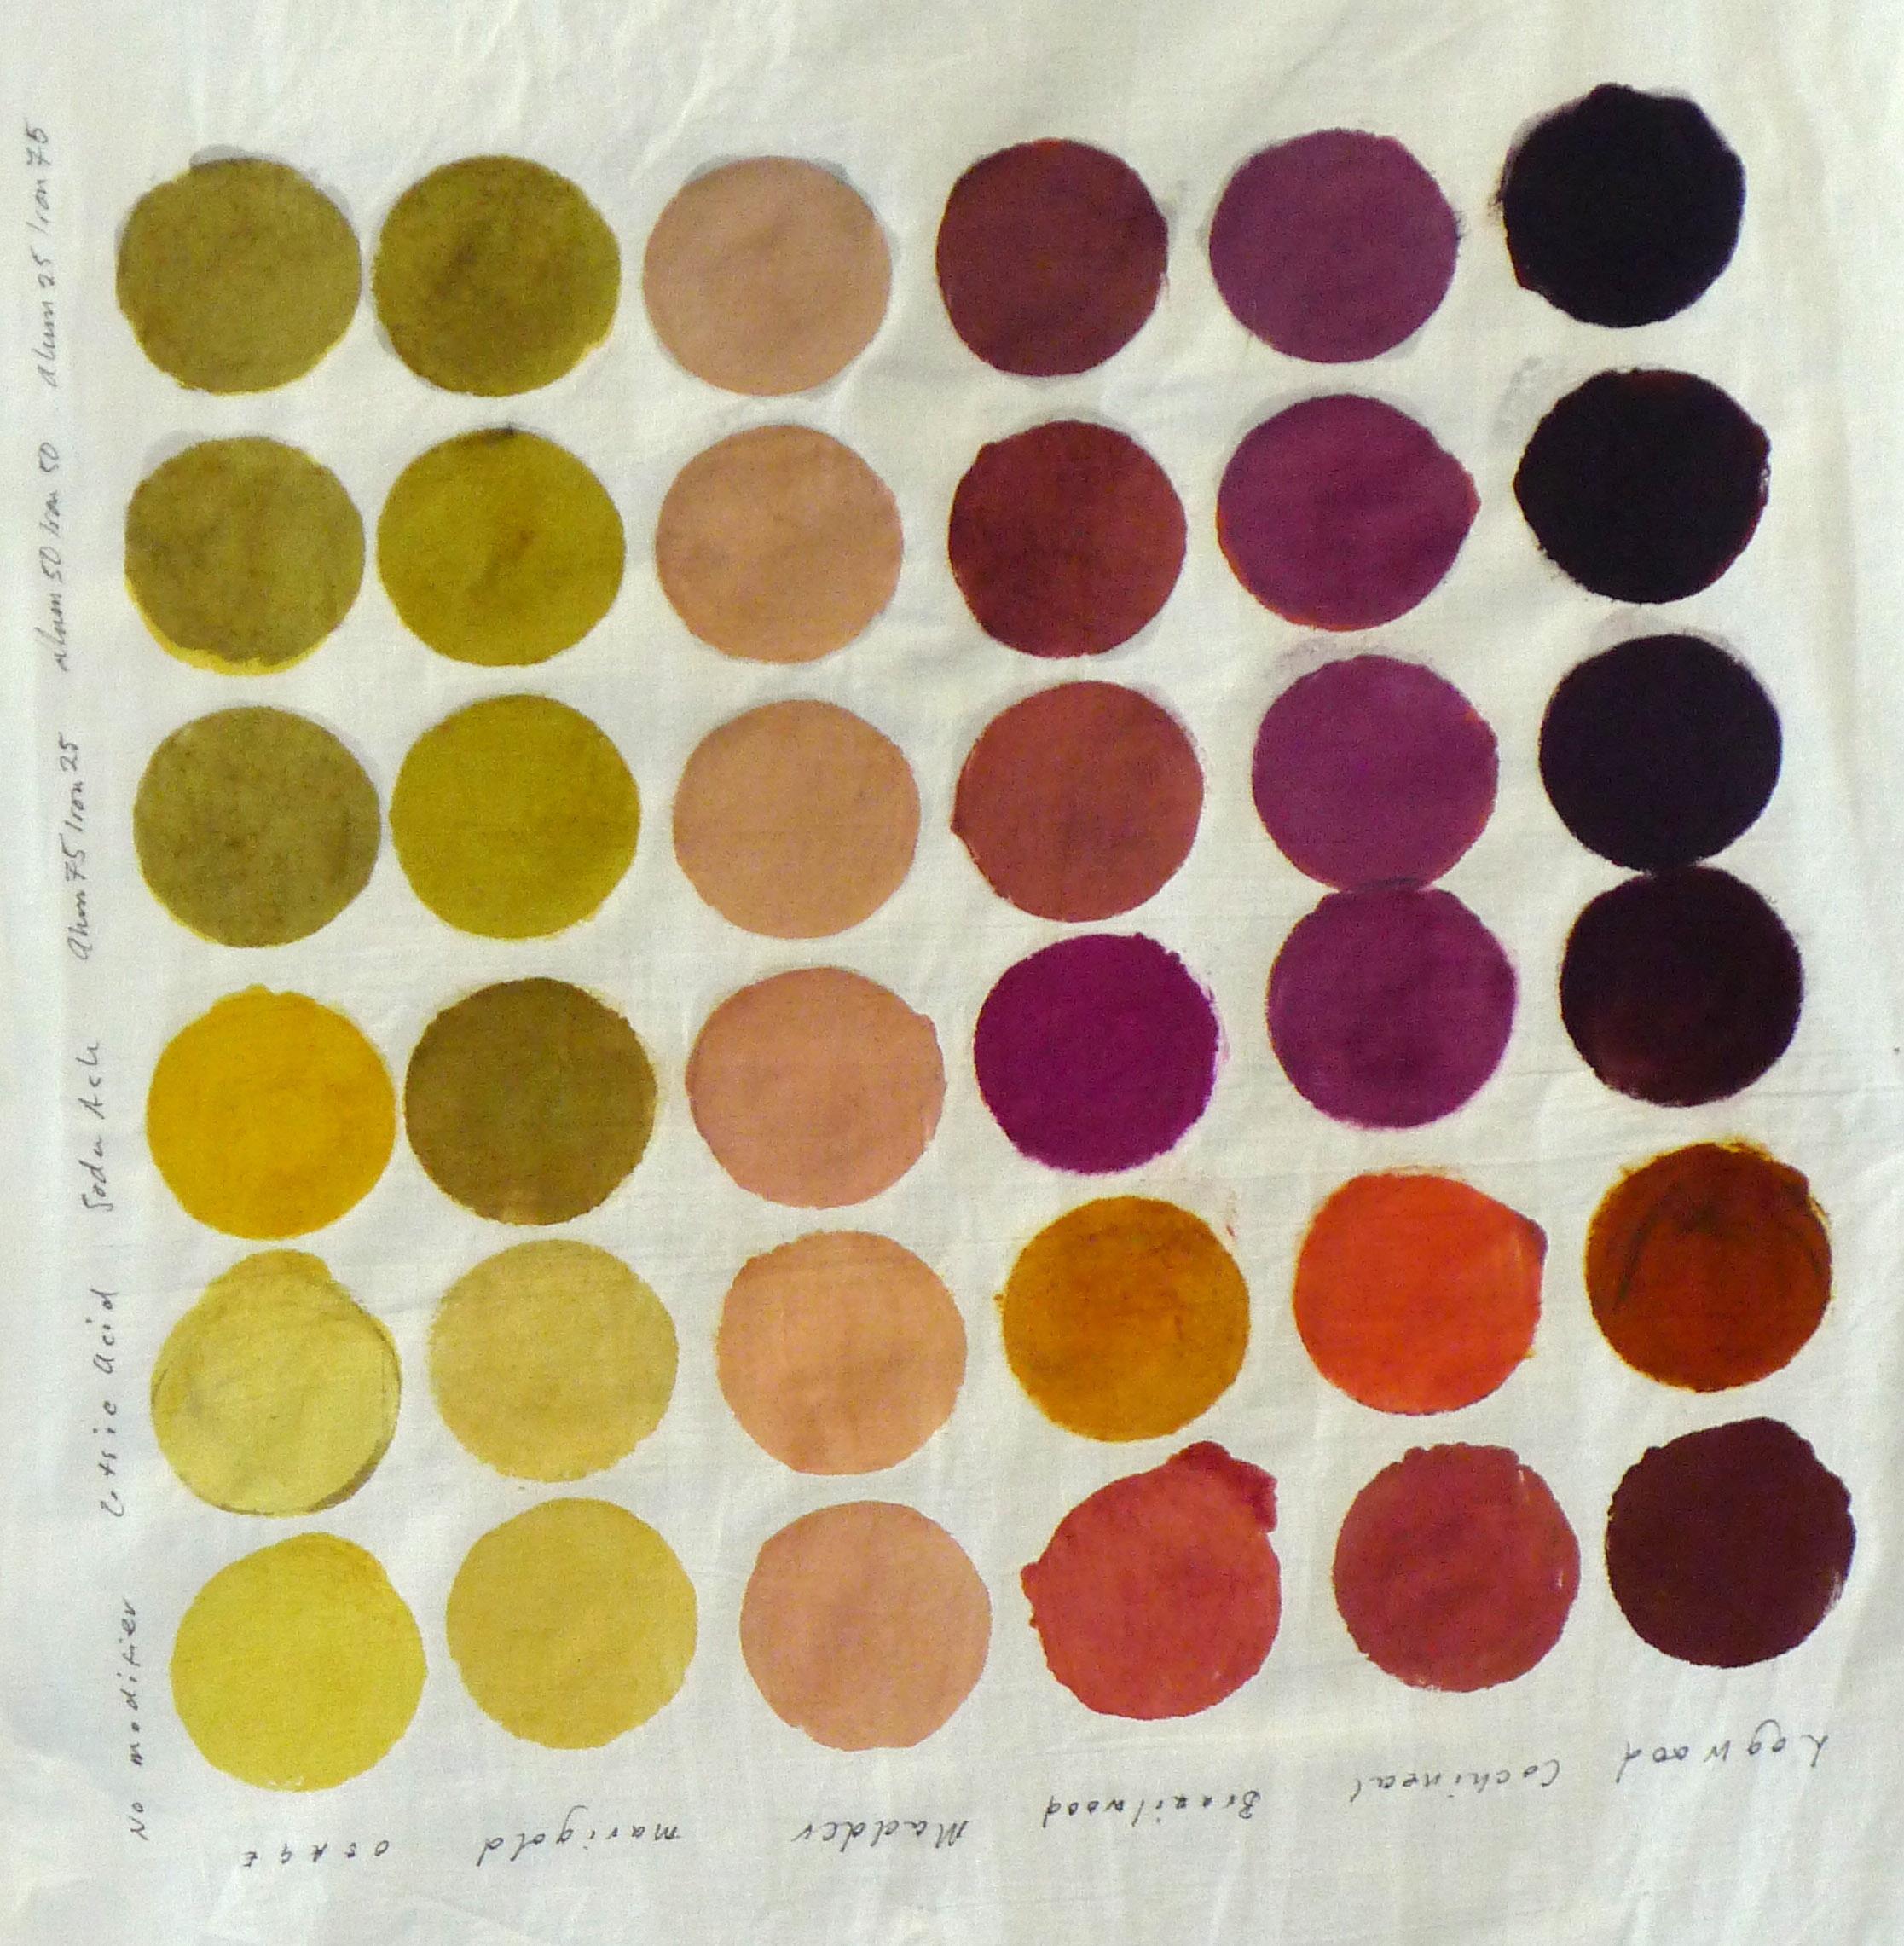 Happenings sheridan textiles happenings nvjuhfo Gallery